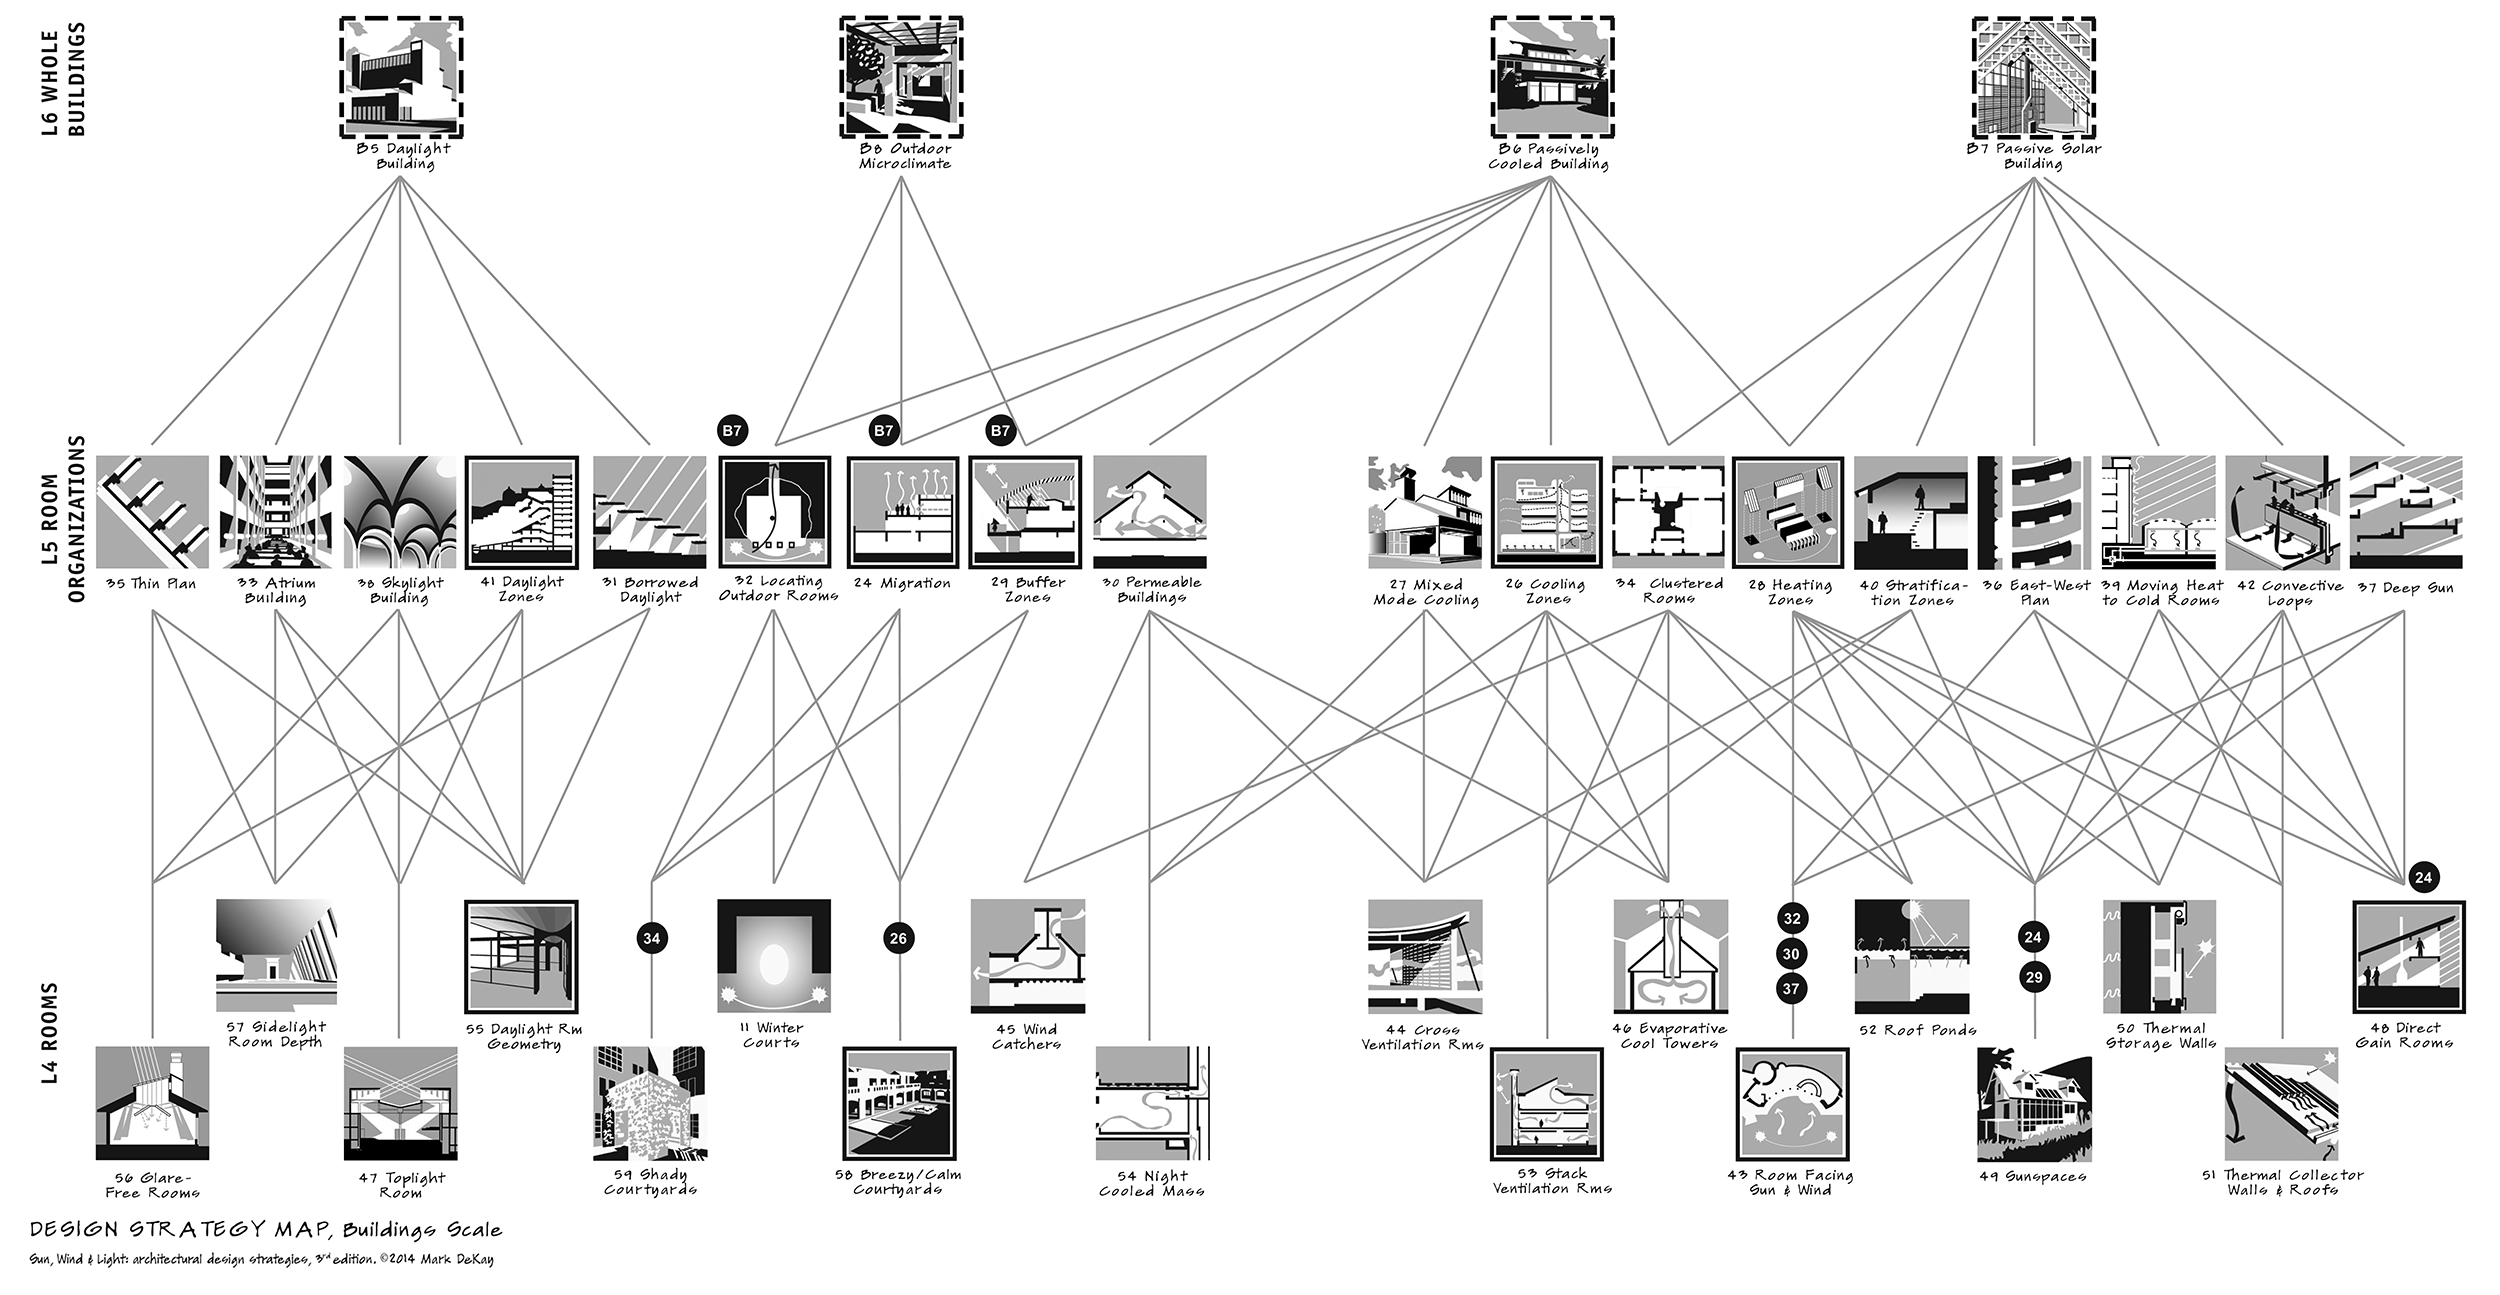 p34-5 Design Strategy Maps: Bldgs Scale